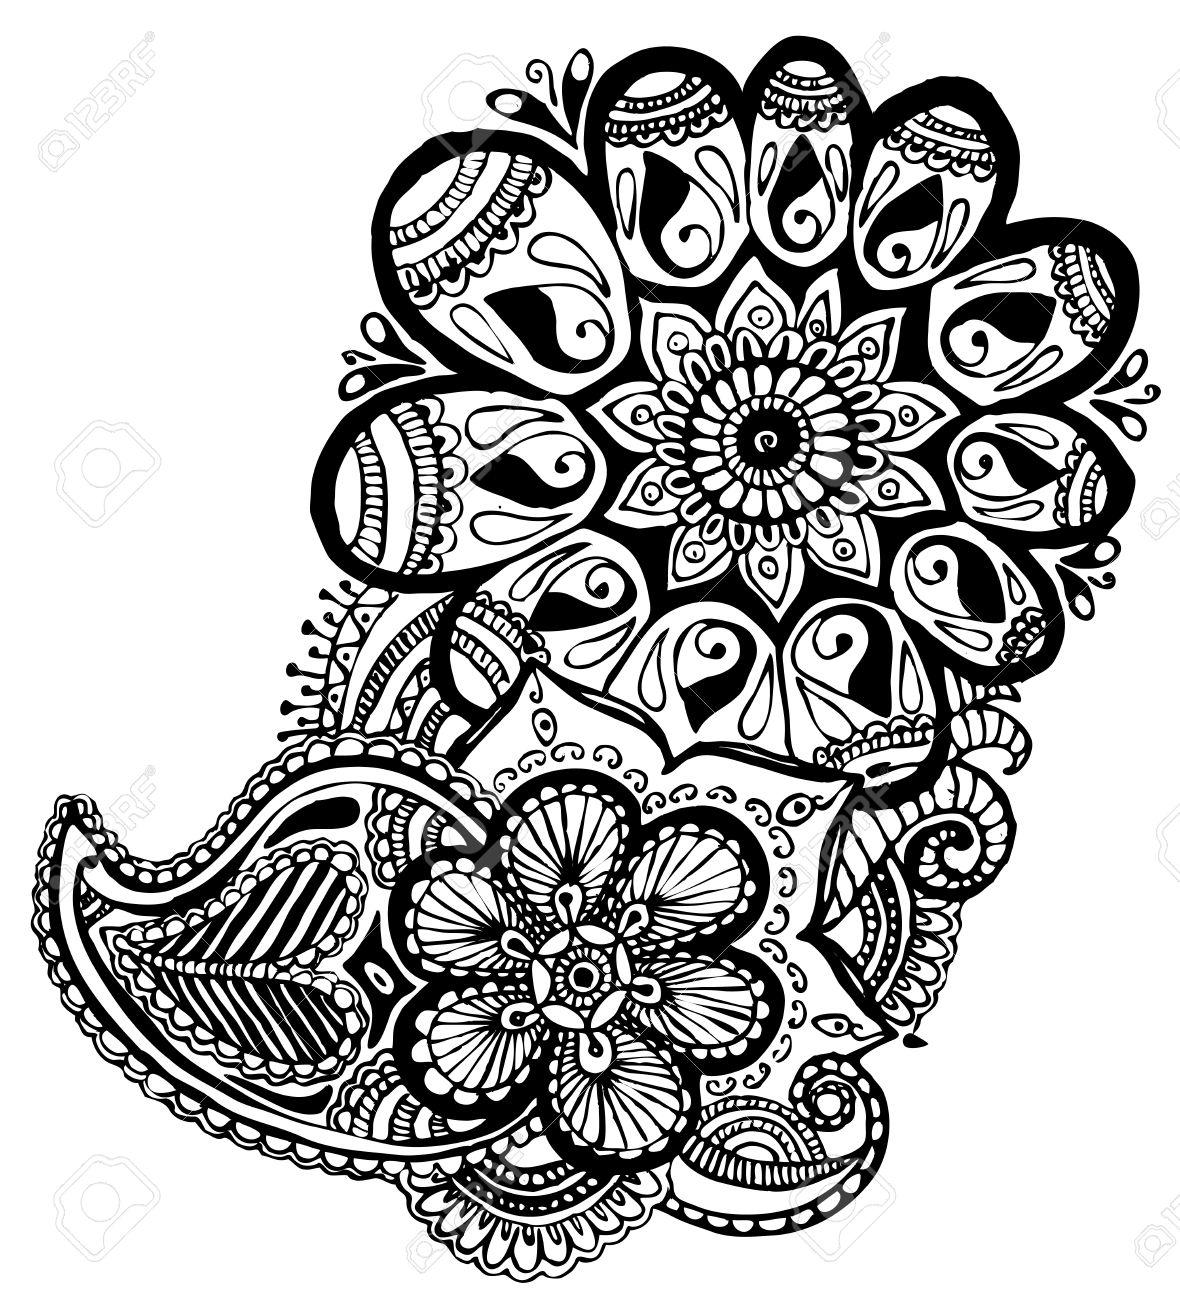 Swirl Design Black Clip Art At Clkercom Vector Clip Art Online